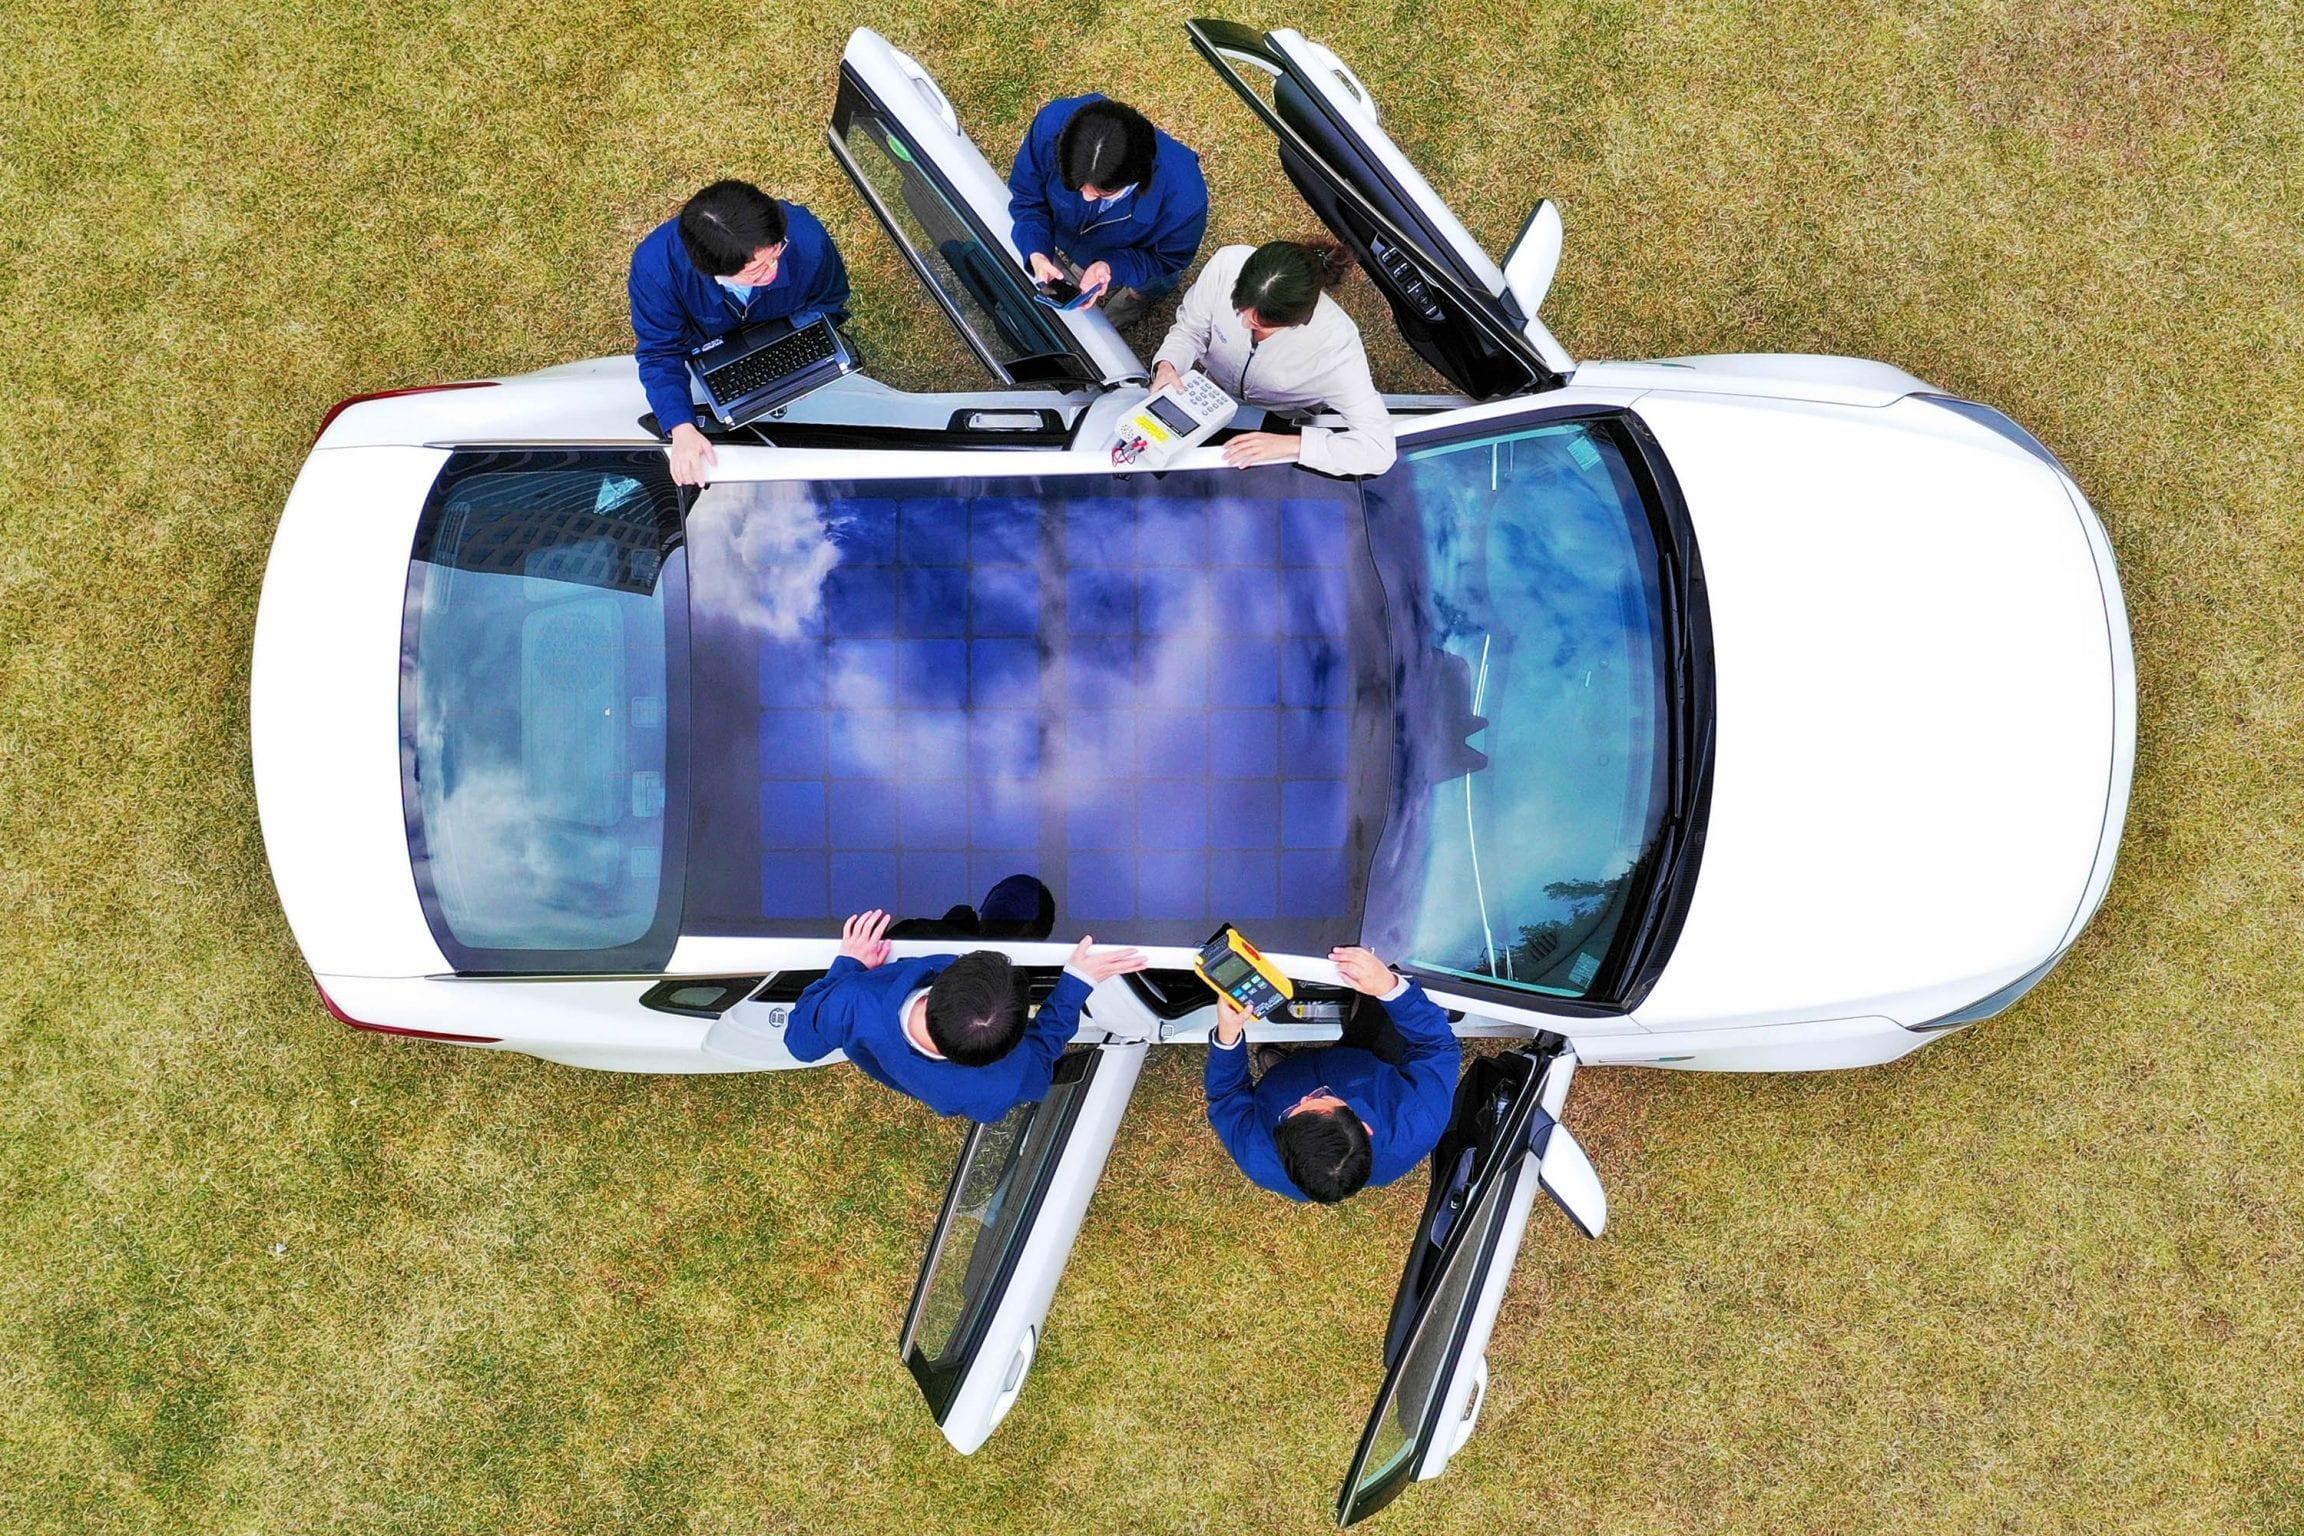 Afbeelding voor Hyundai onthult oplaadsysteem op zonne-energie voor toekomstige geëlektrificeerde auto's